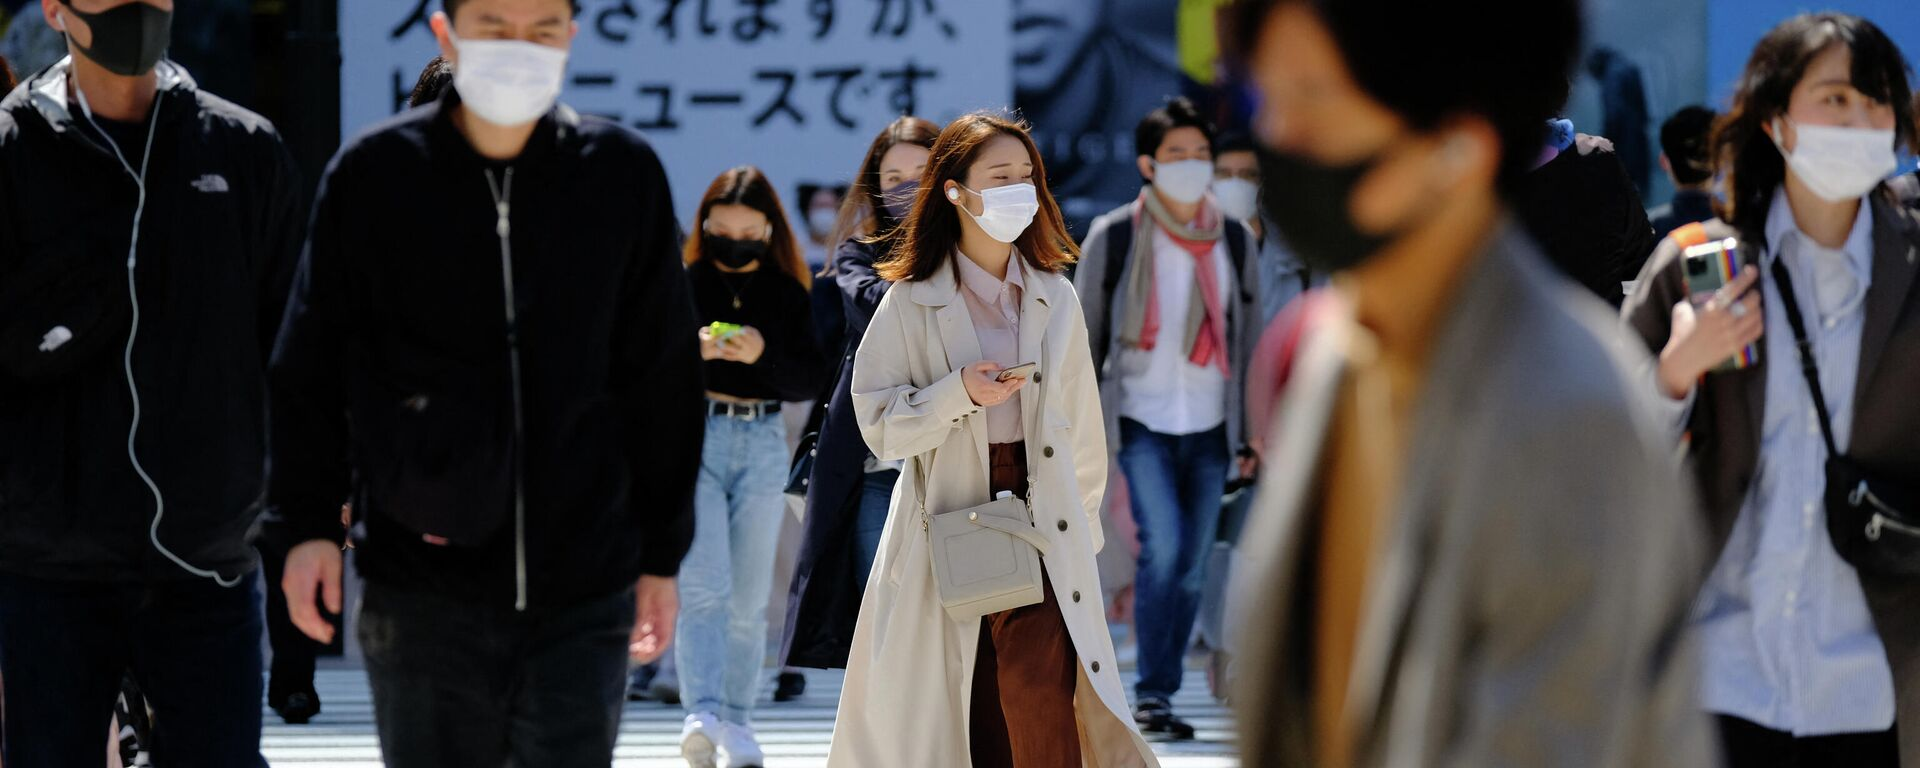 Pandemia en Japón - Sputnik Mundo, 1920, 19.04.2021